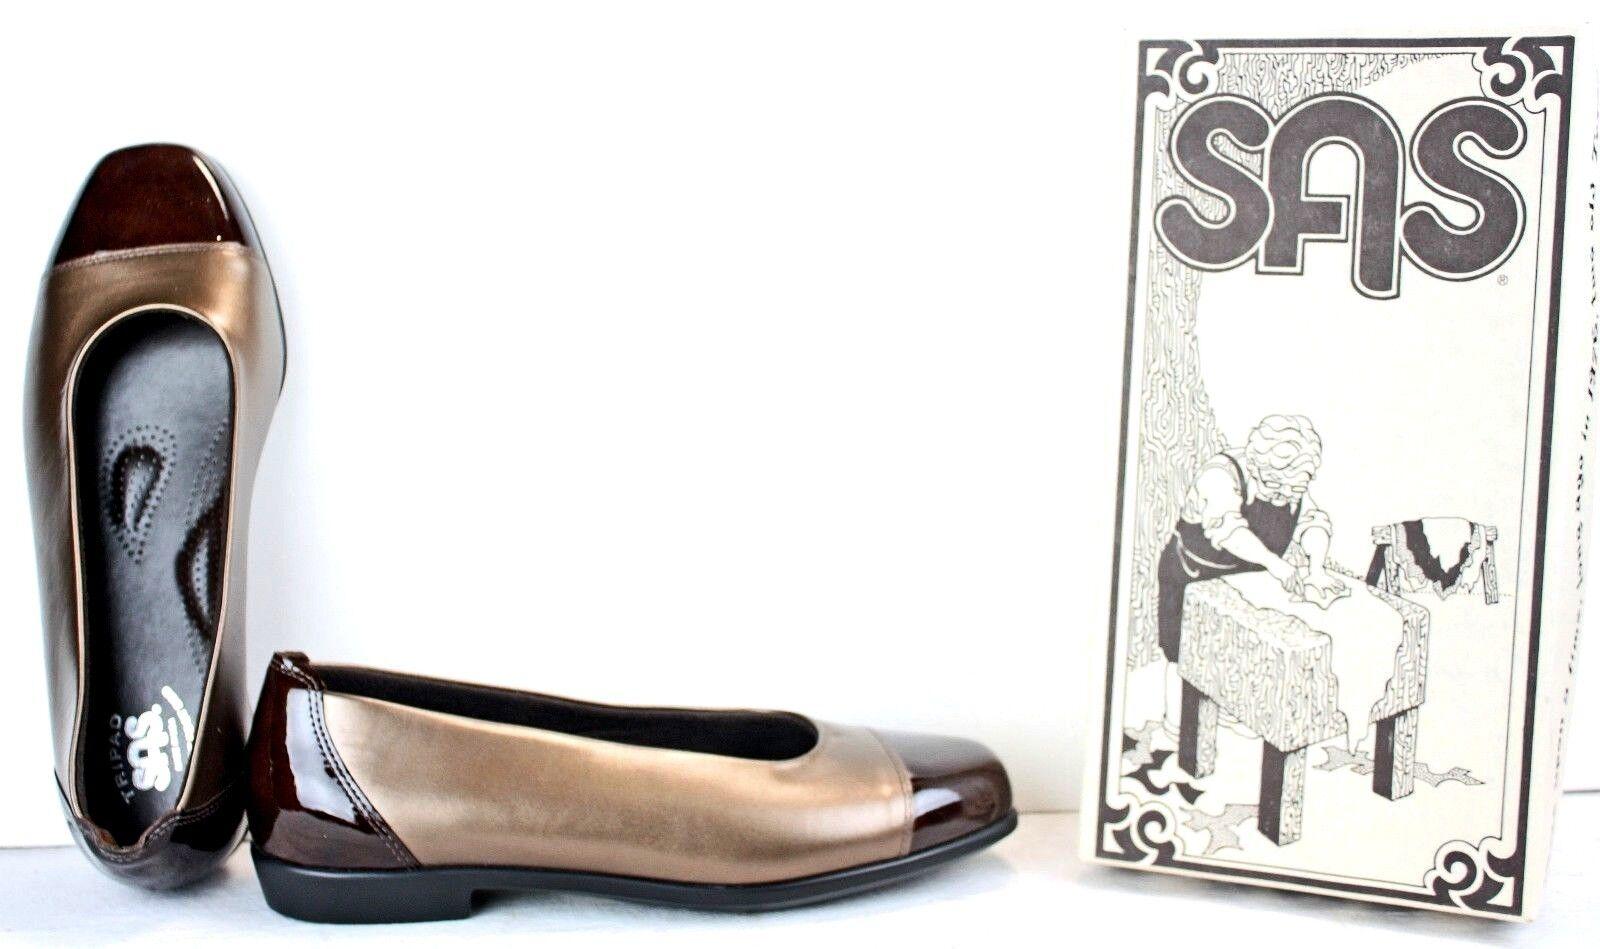 SAS Tripad Comfort Damenschuhe Loafers Größe 9.5 W Bronze Braun Leder MO27 FW76